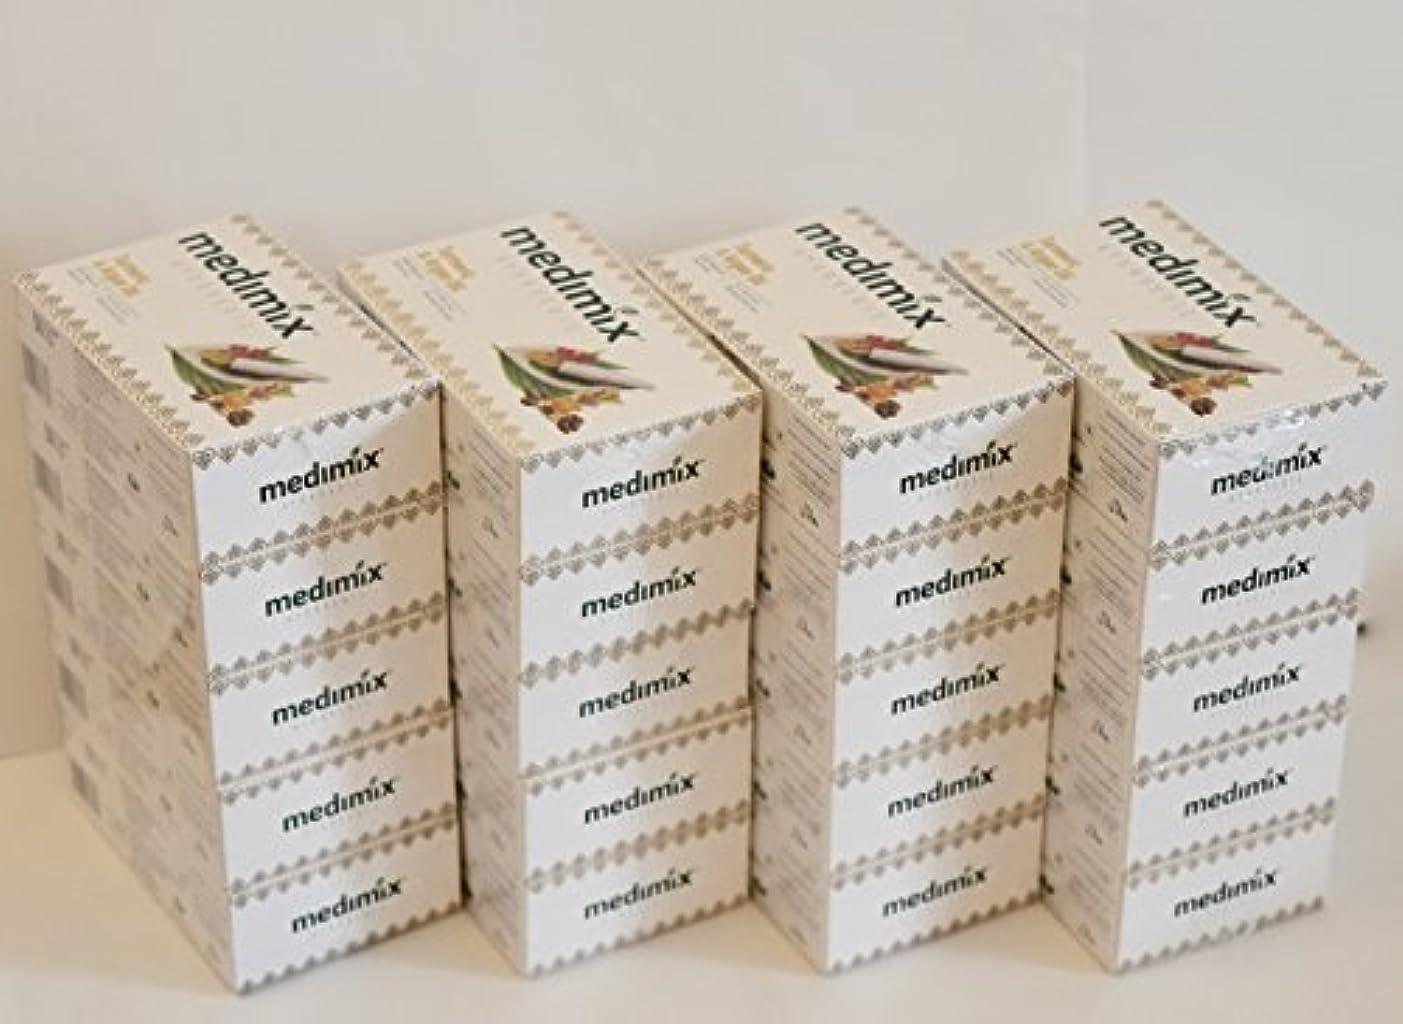 MEDIMIX メディミックス アーユルヴェーダ ターメリック アンド アルガン石鹸(medimix AYURVEDA Turmeric & Argan) 125g 20個入り